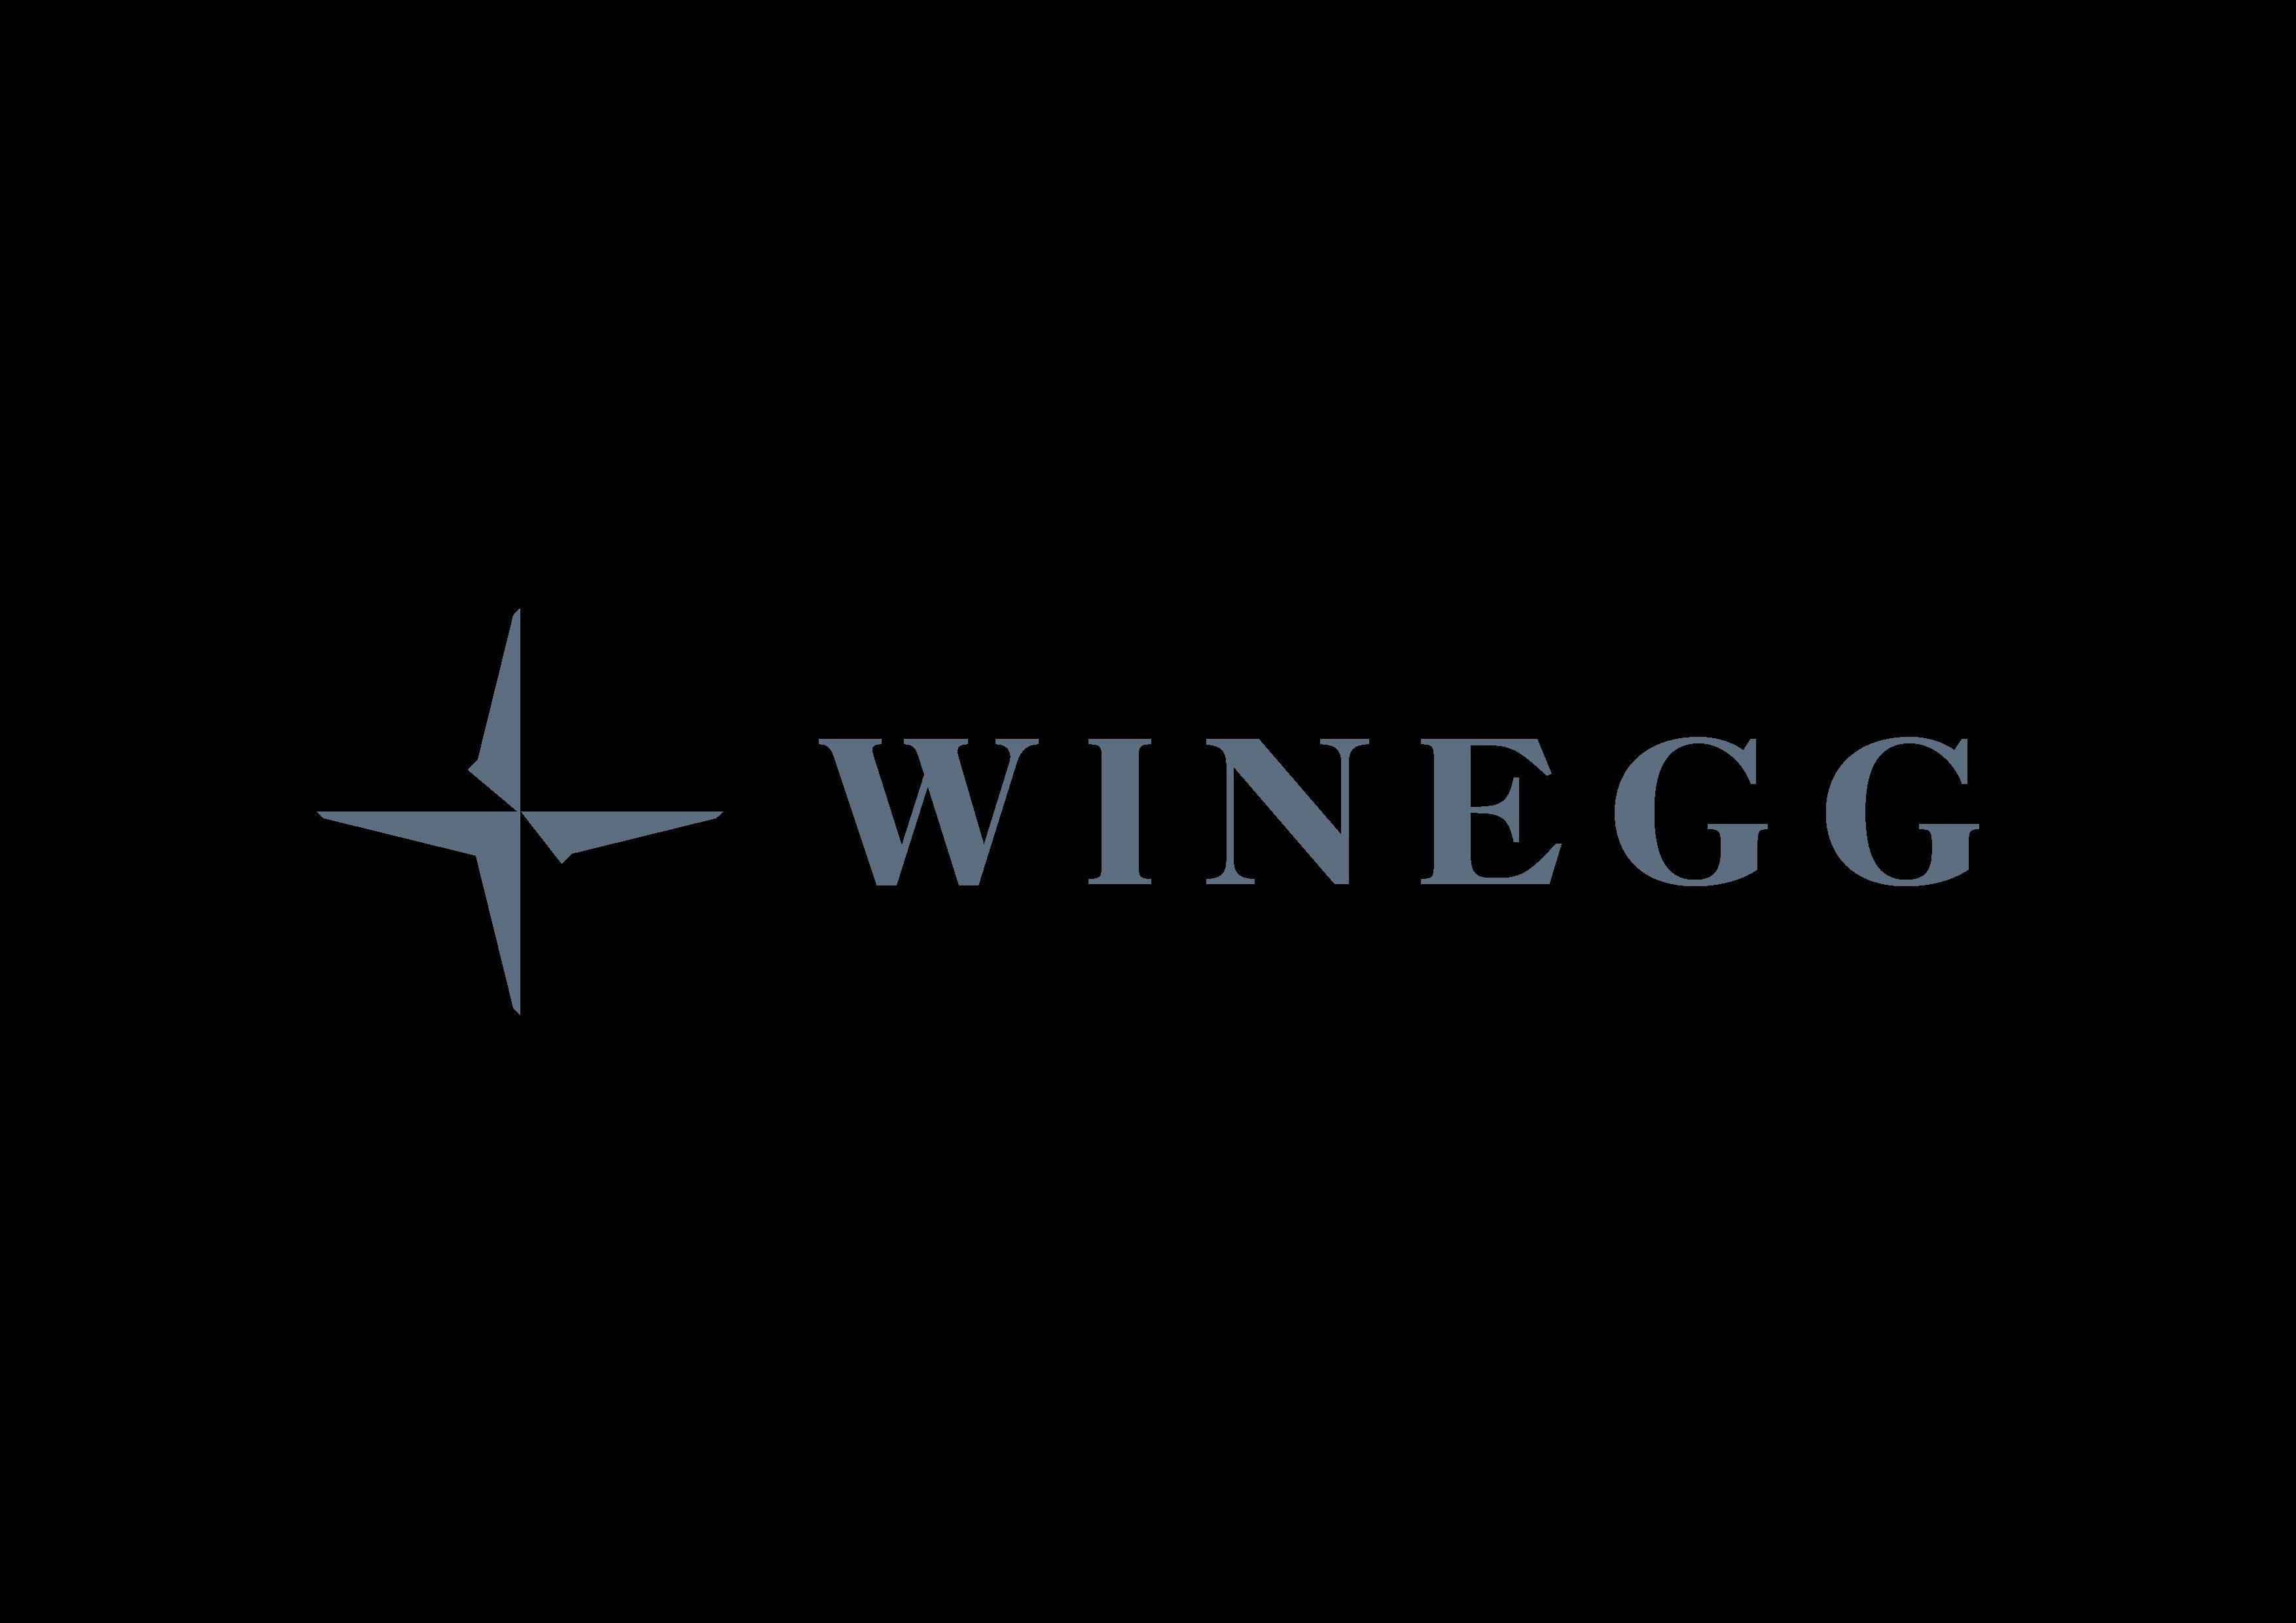 Winegg